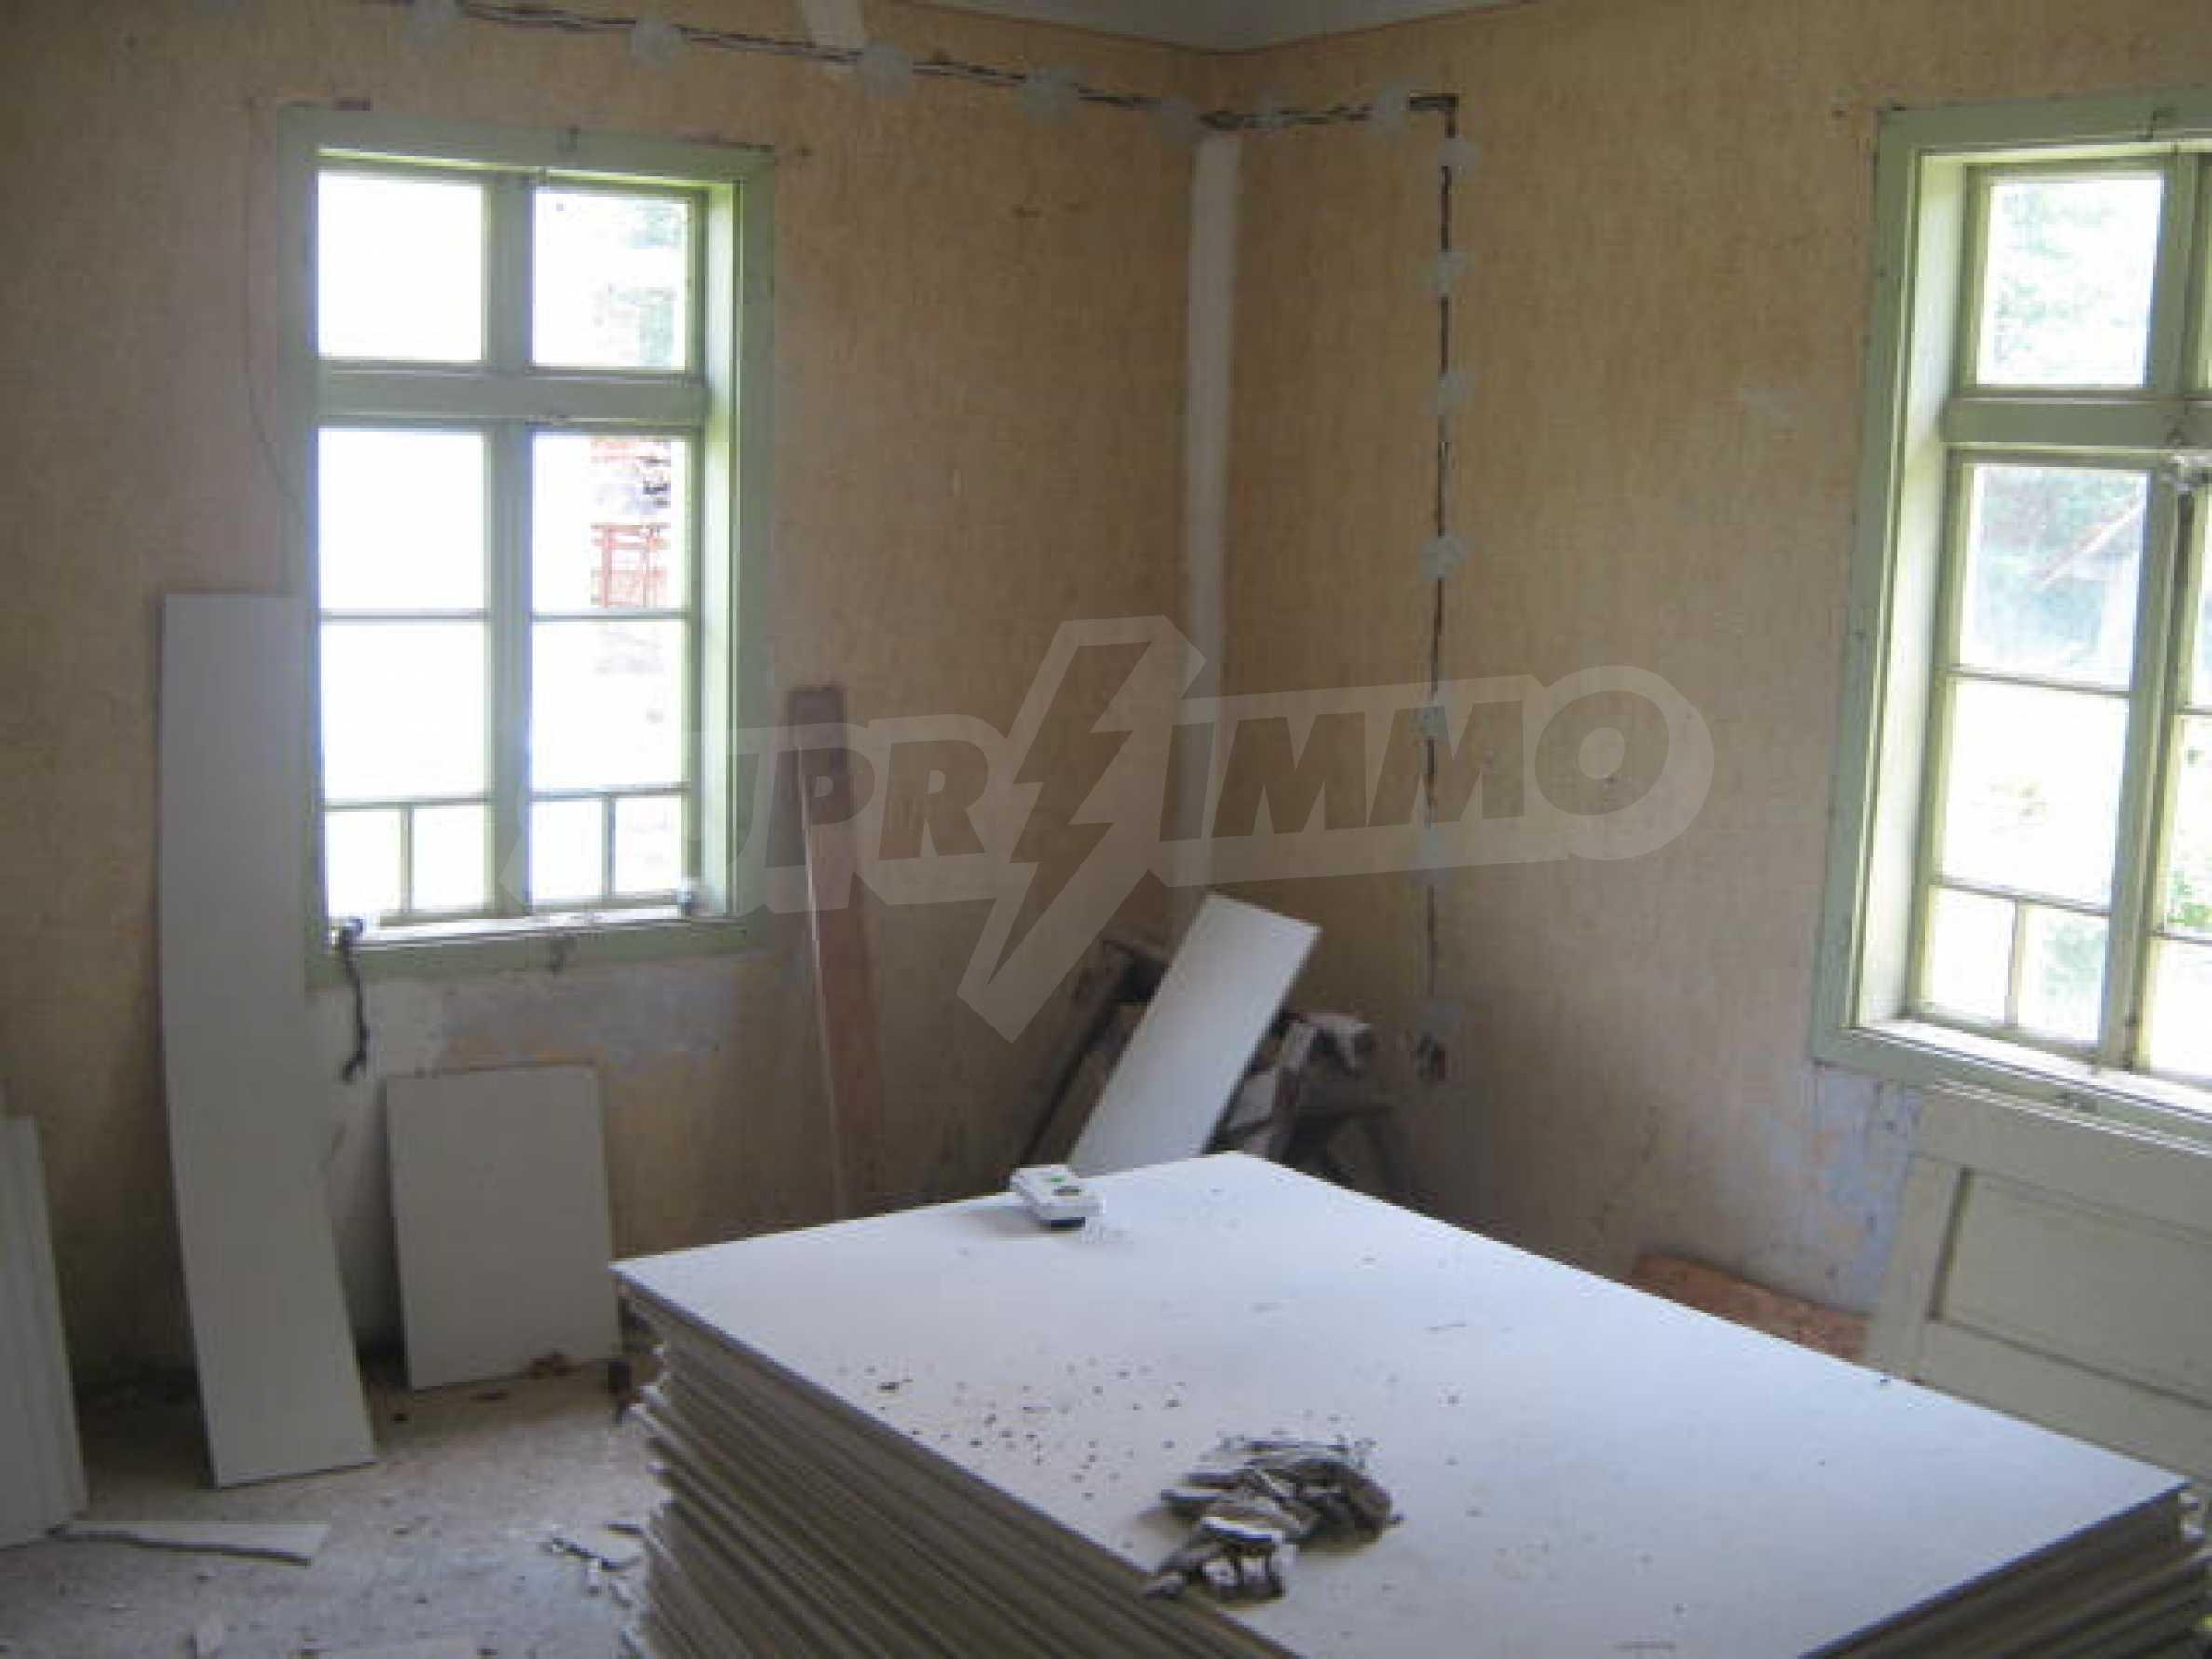 House for sale in village near Vidin 3